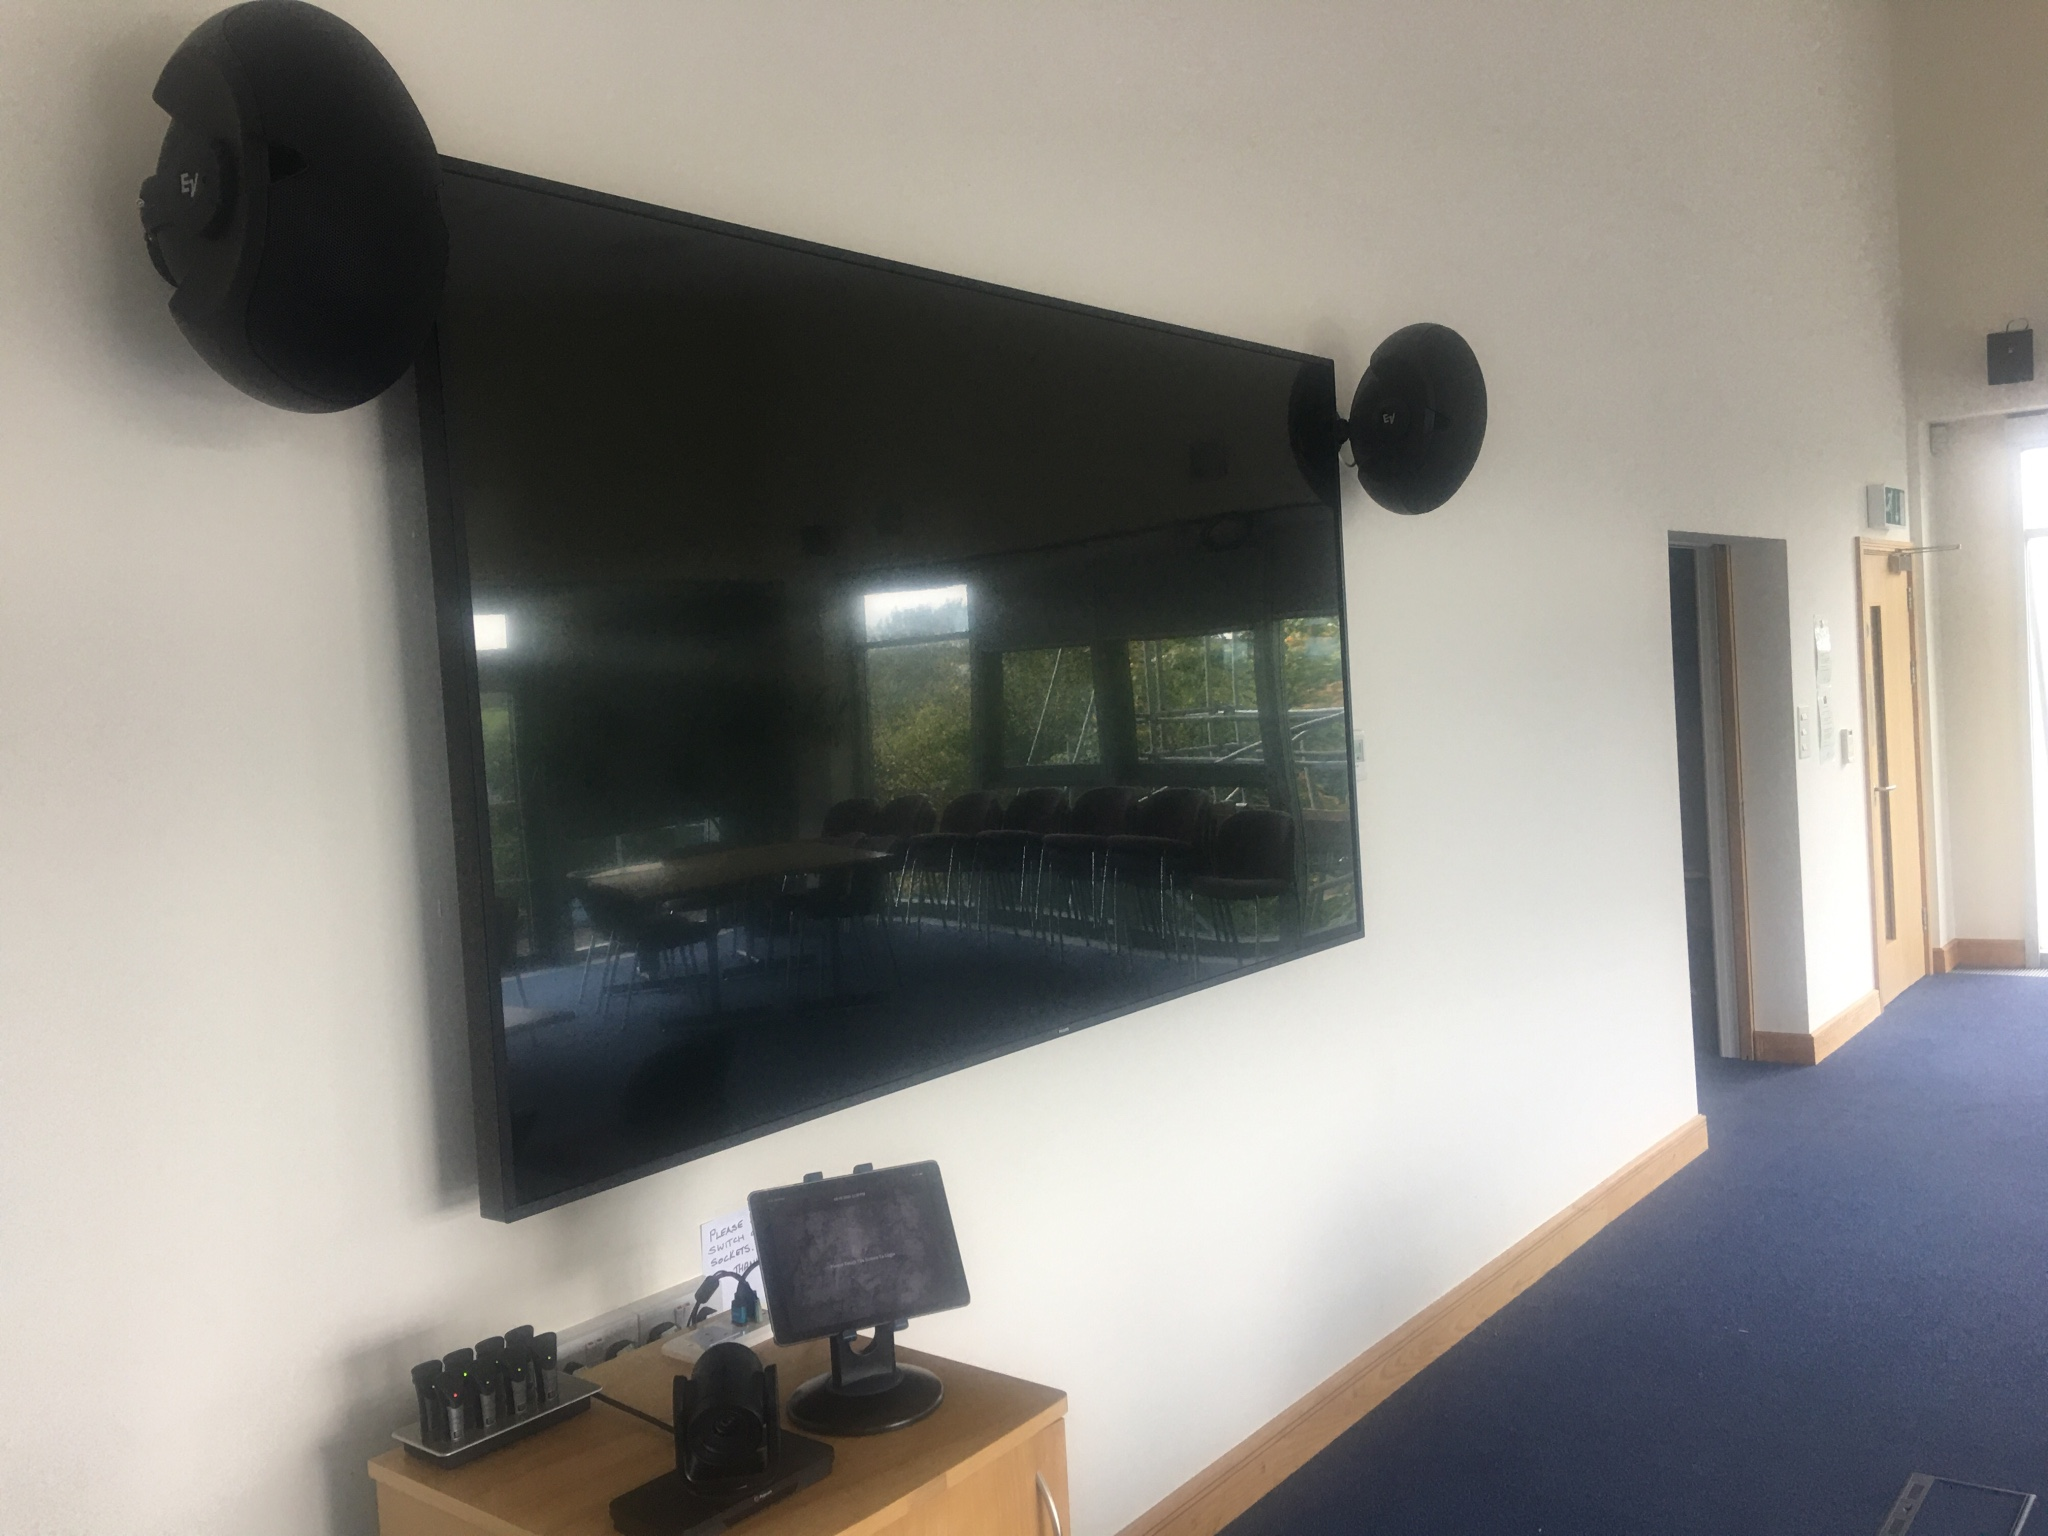 Beacon Centre Video Conferencing Upgrades - PAI